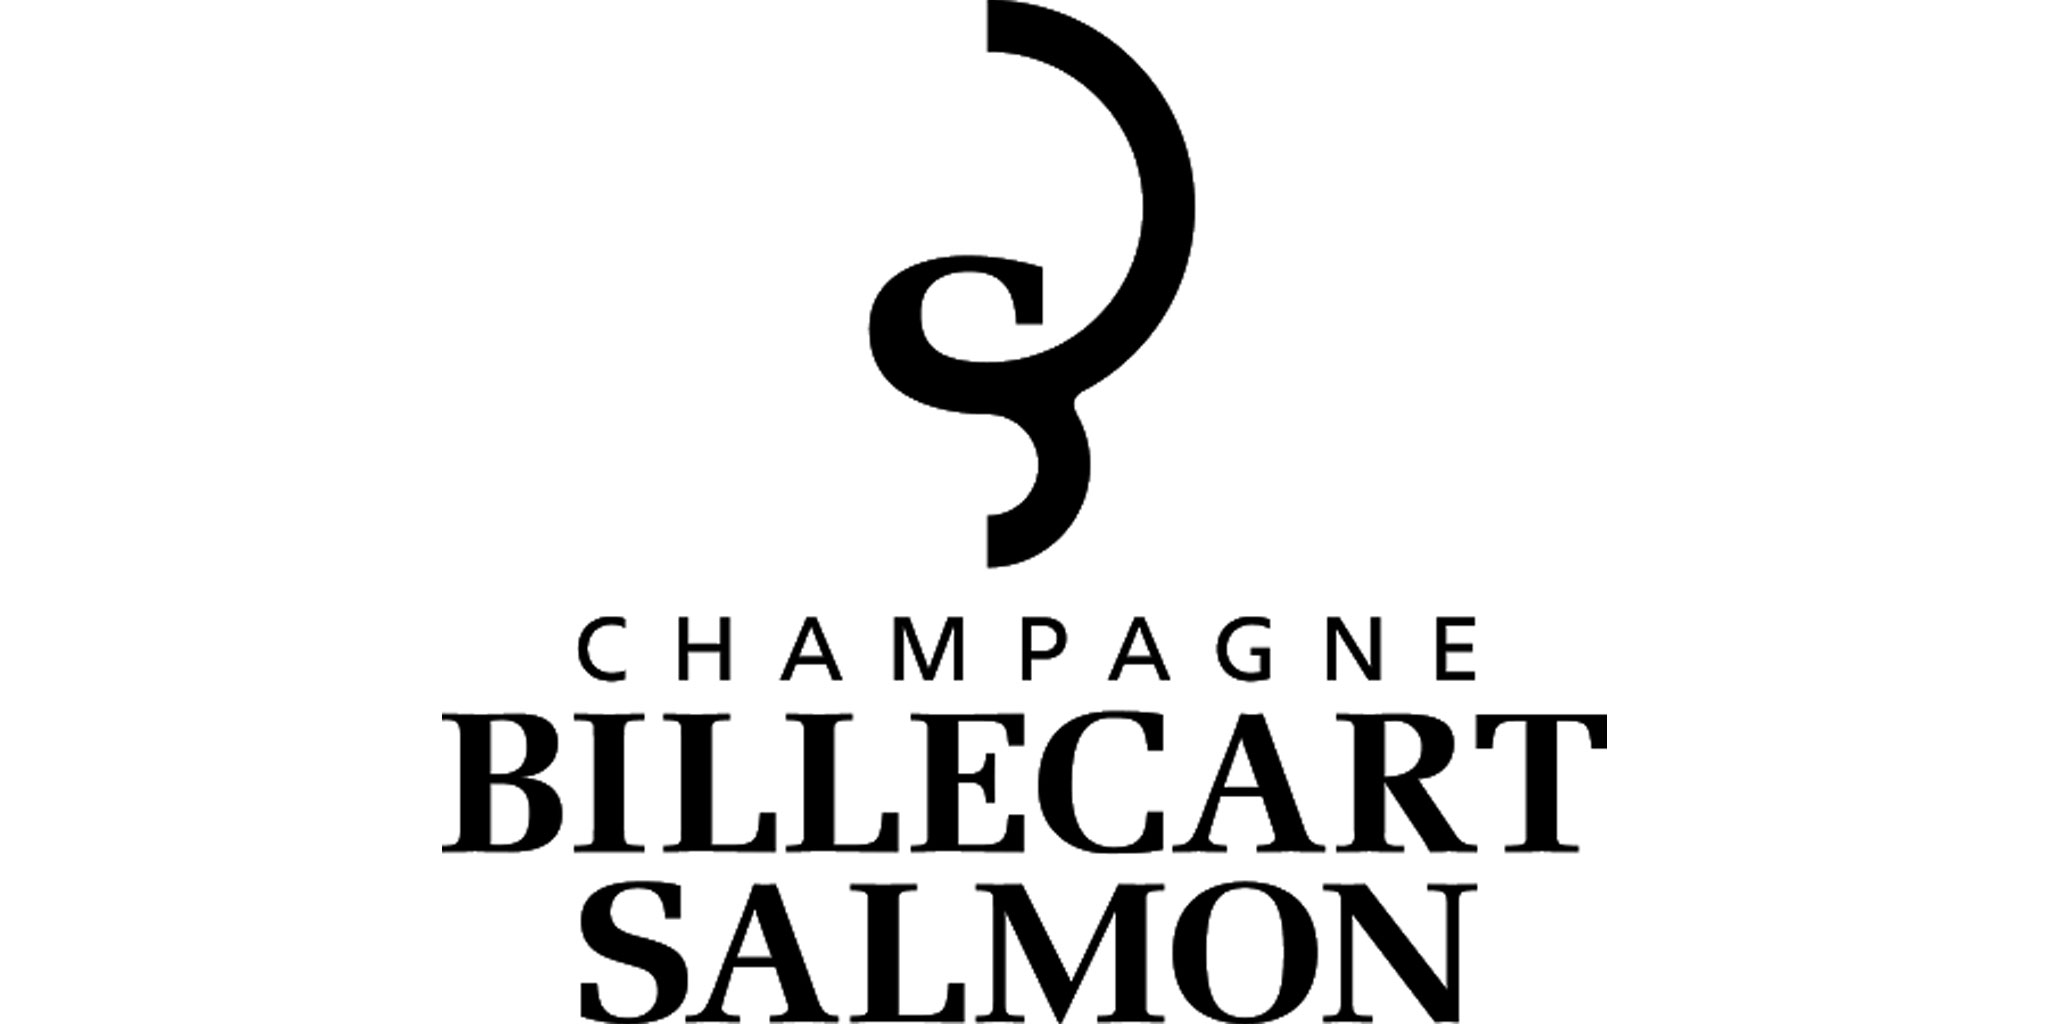 Billecart-Salmon logo